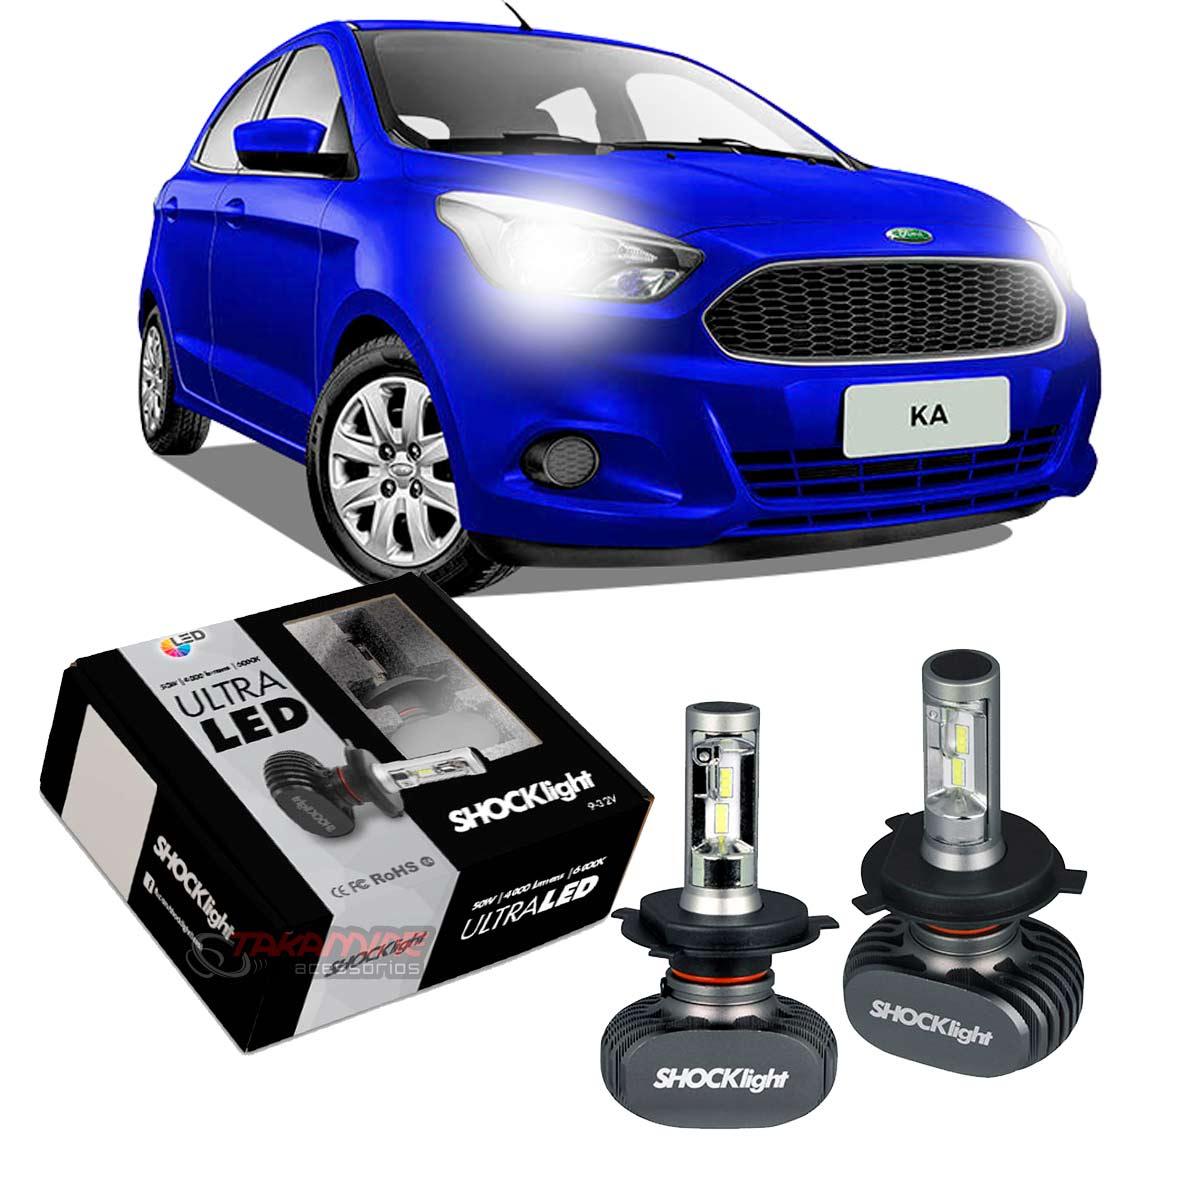 Kit Ultra LED Ka 2015 2016 2017 2018 2019 2020 tipo xenon farol alto e baixo H4 50 W